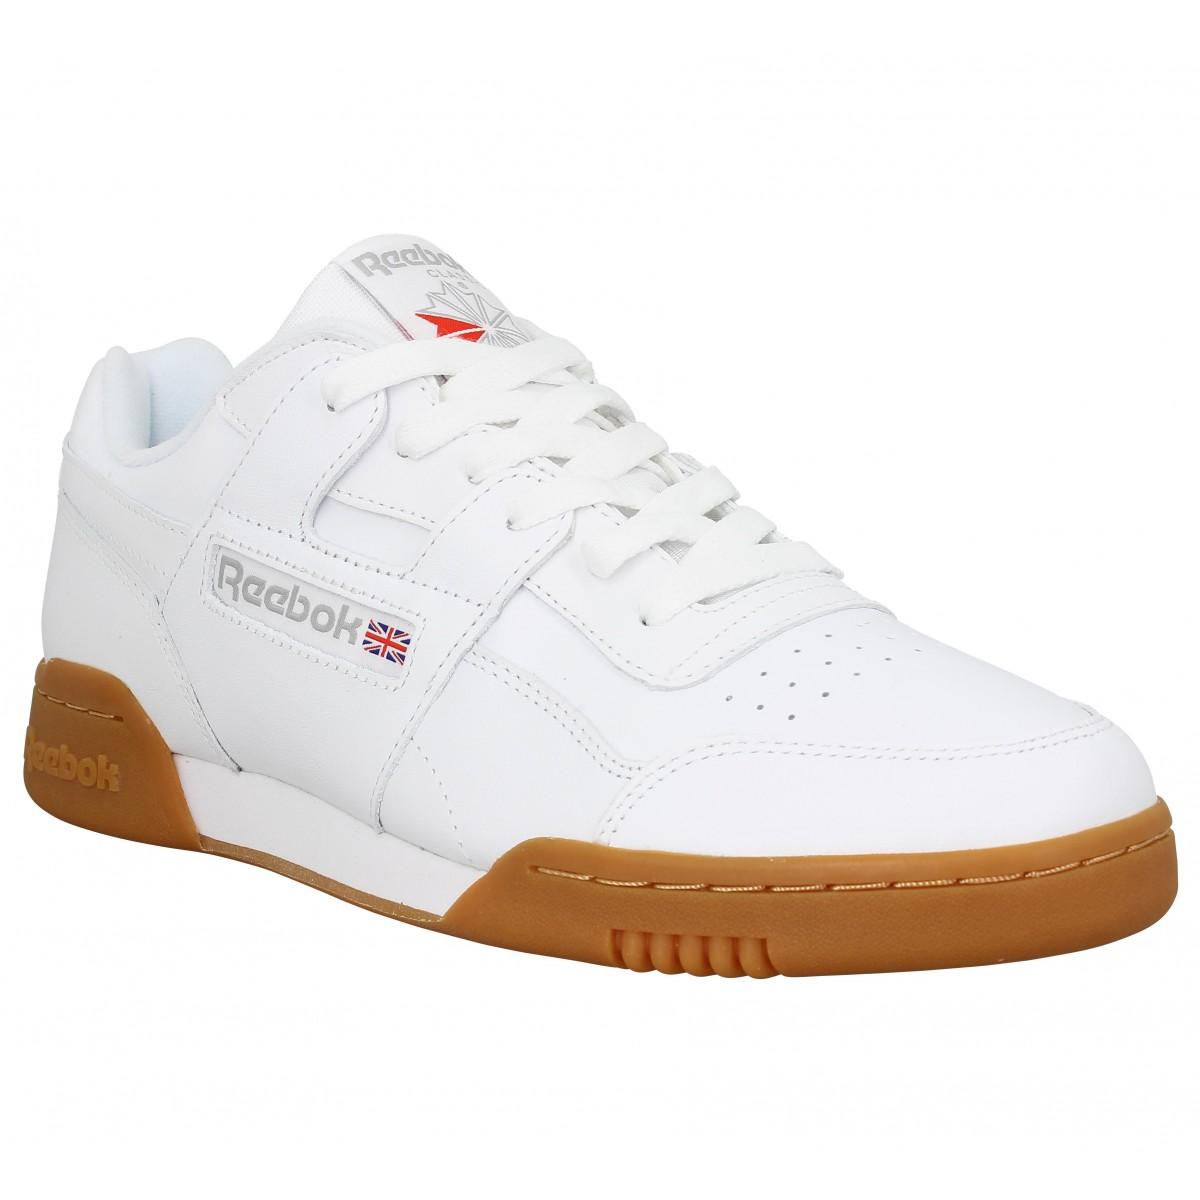 homme chaussure sneakers chaussure homme chaussure sneakers reebok reebok qzUMVSp